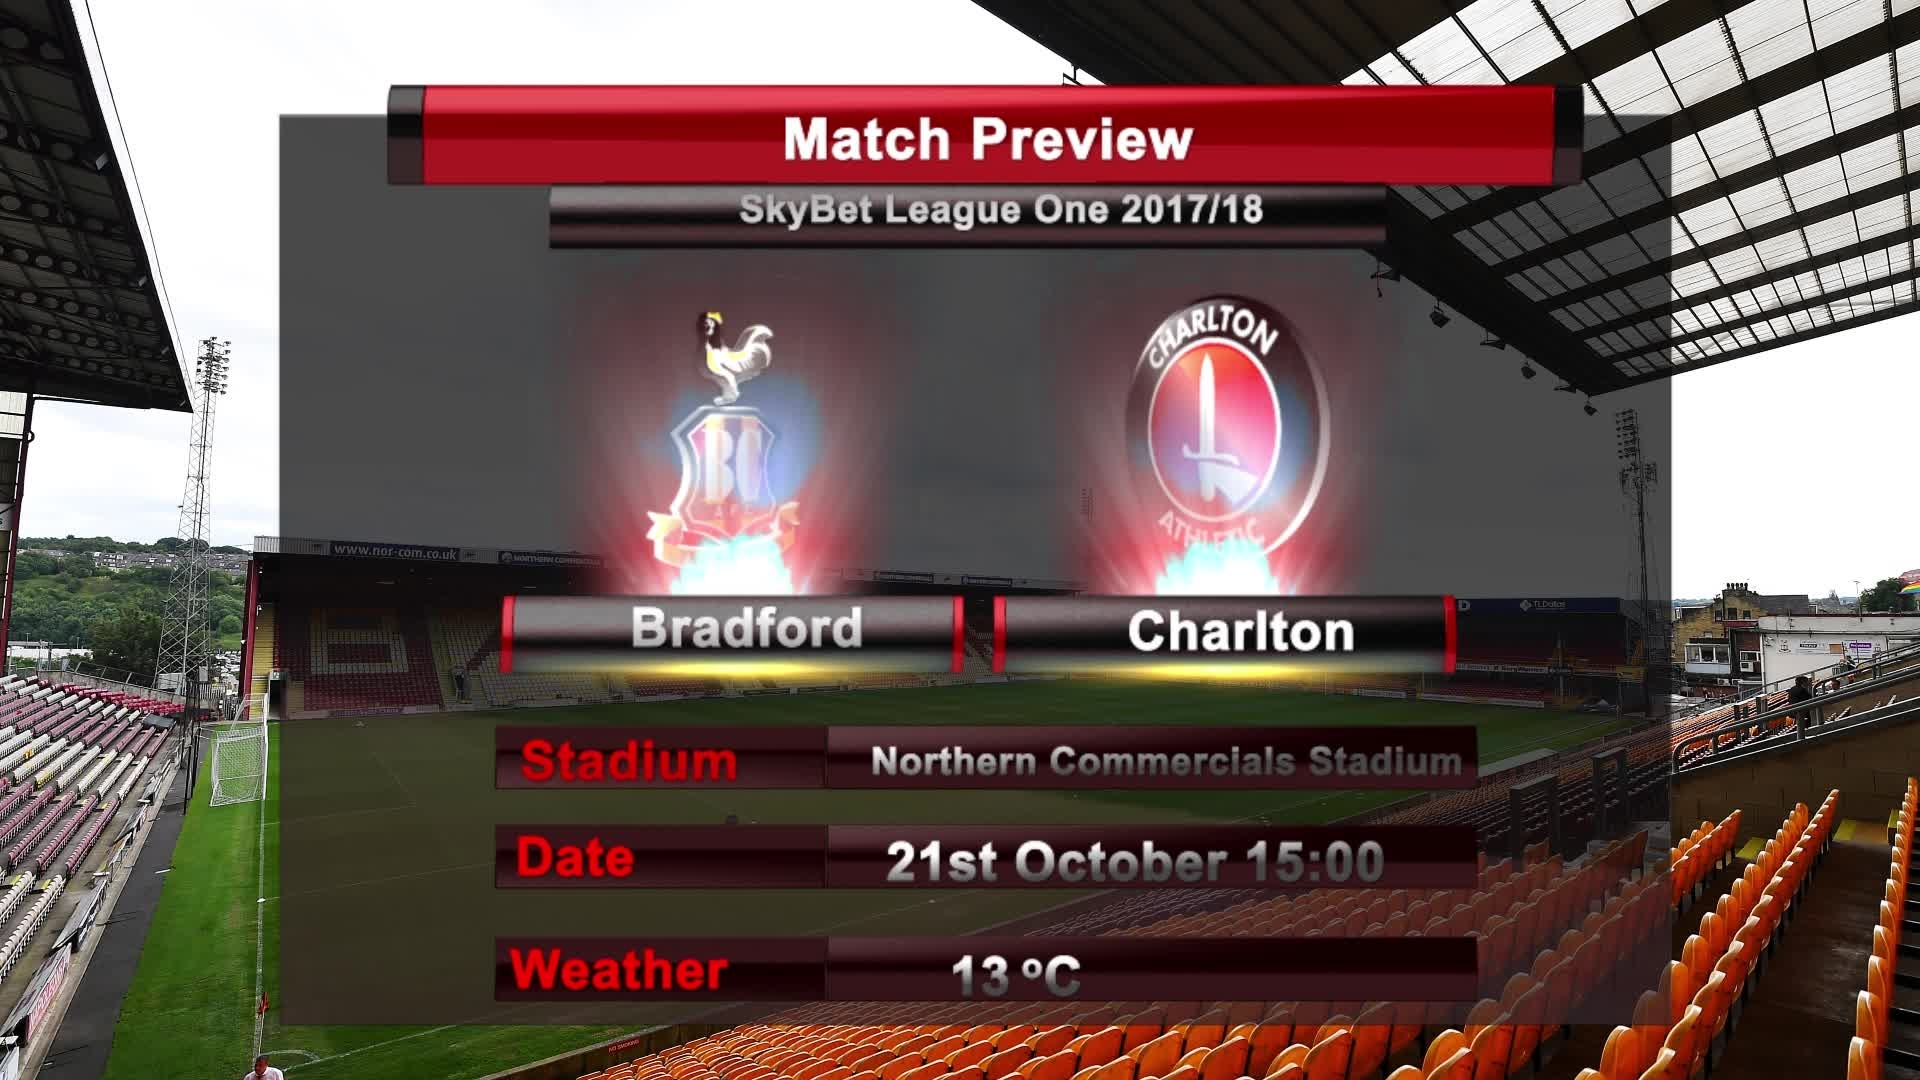 MATCH PREVIEW | Bradford vs Charlton